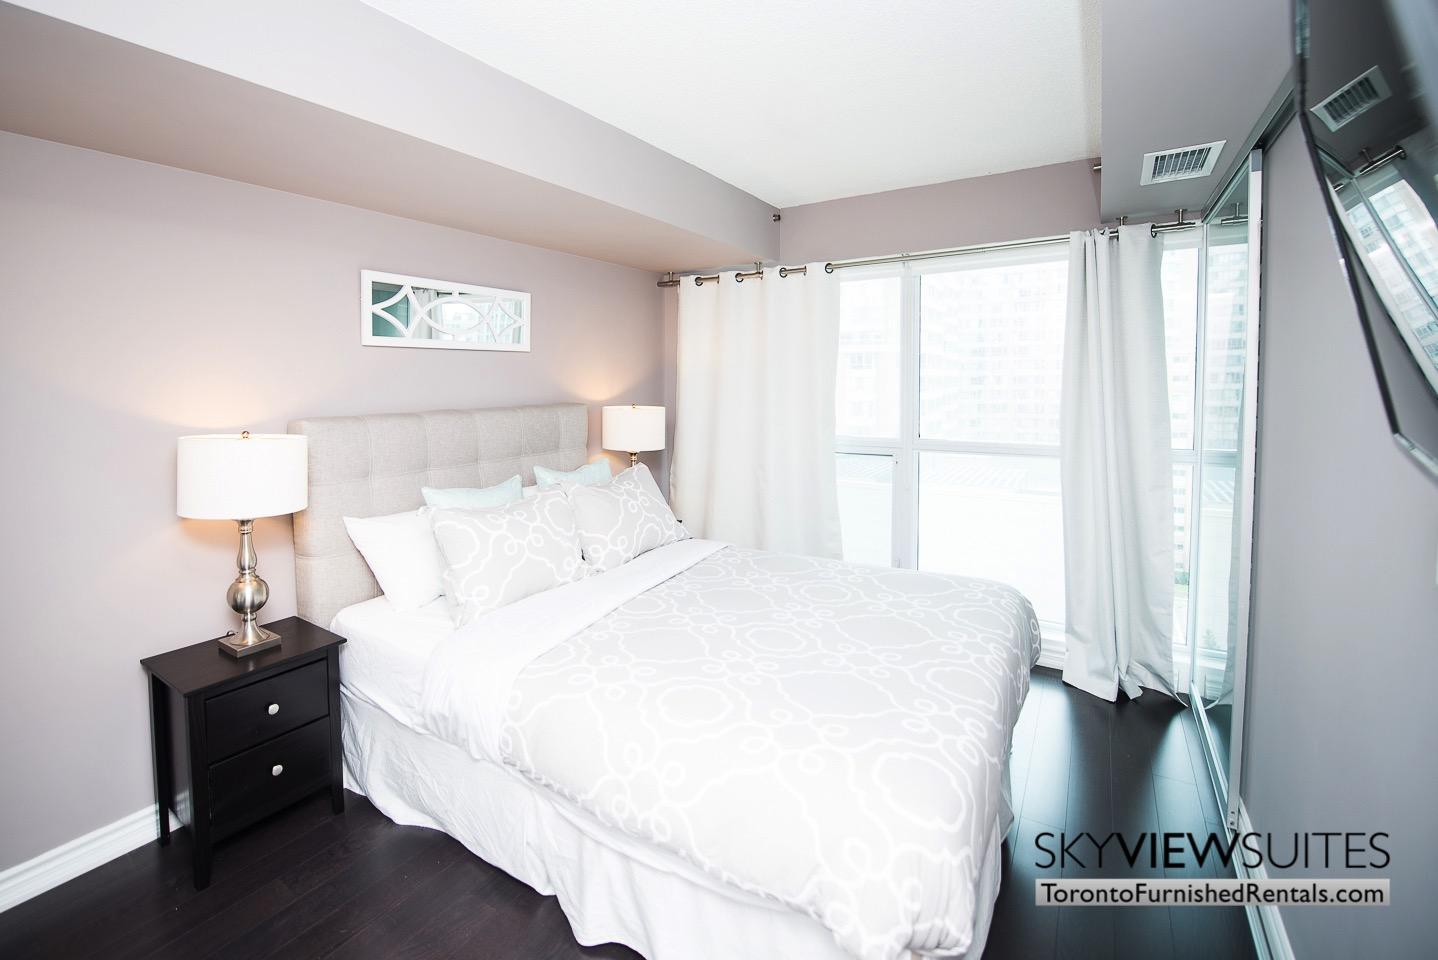 furnished-rentals-toronto-bedroom-college